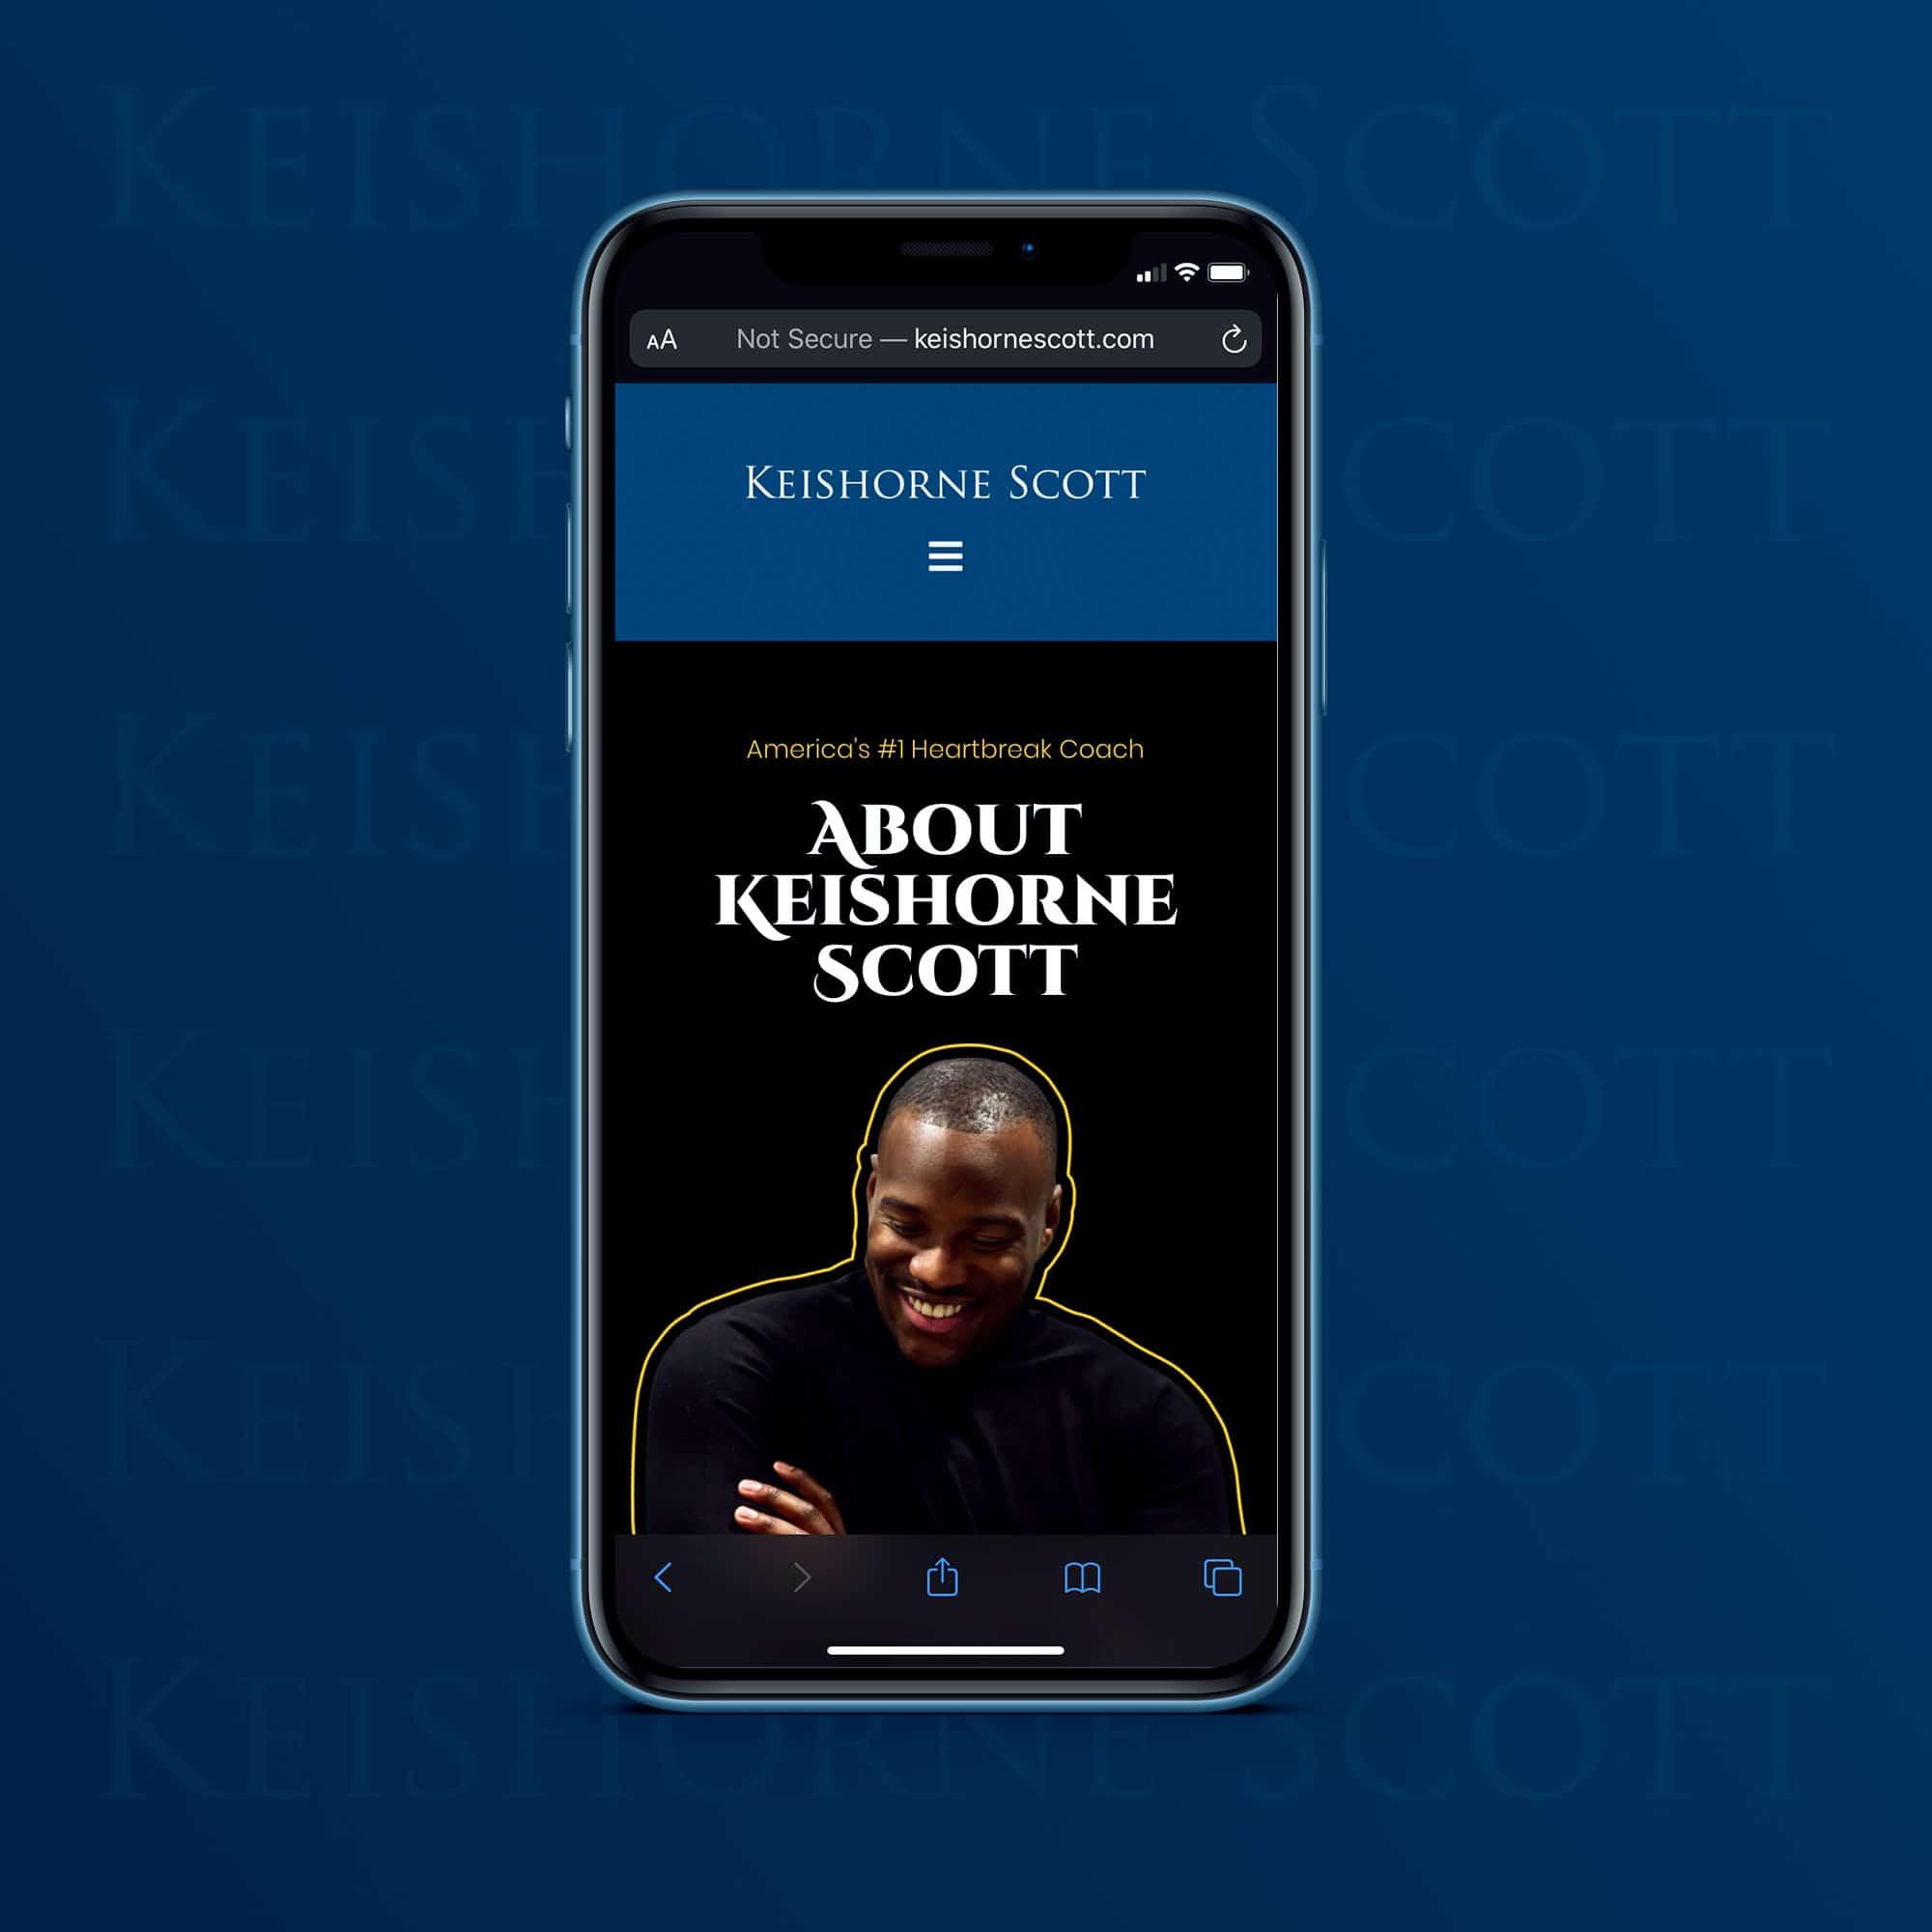 KeishorneScott.com website design by JessMadeIt